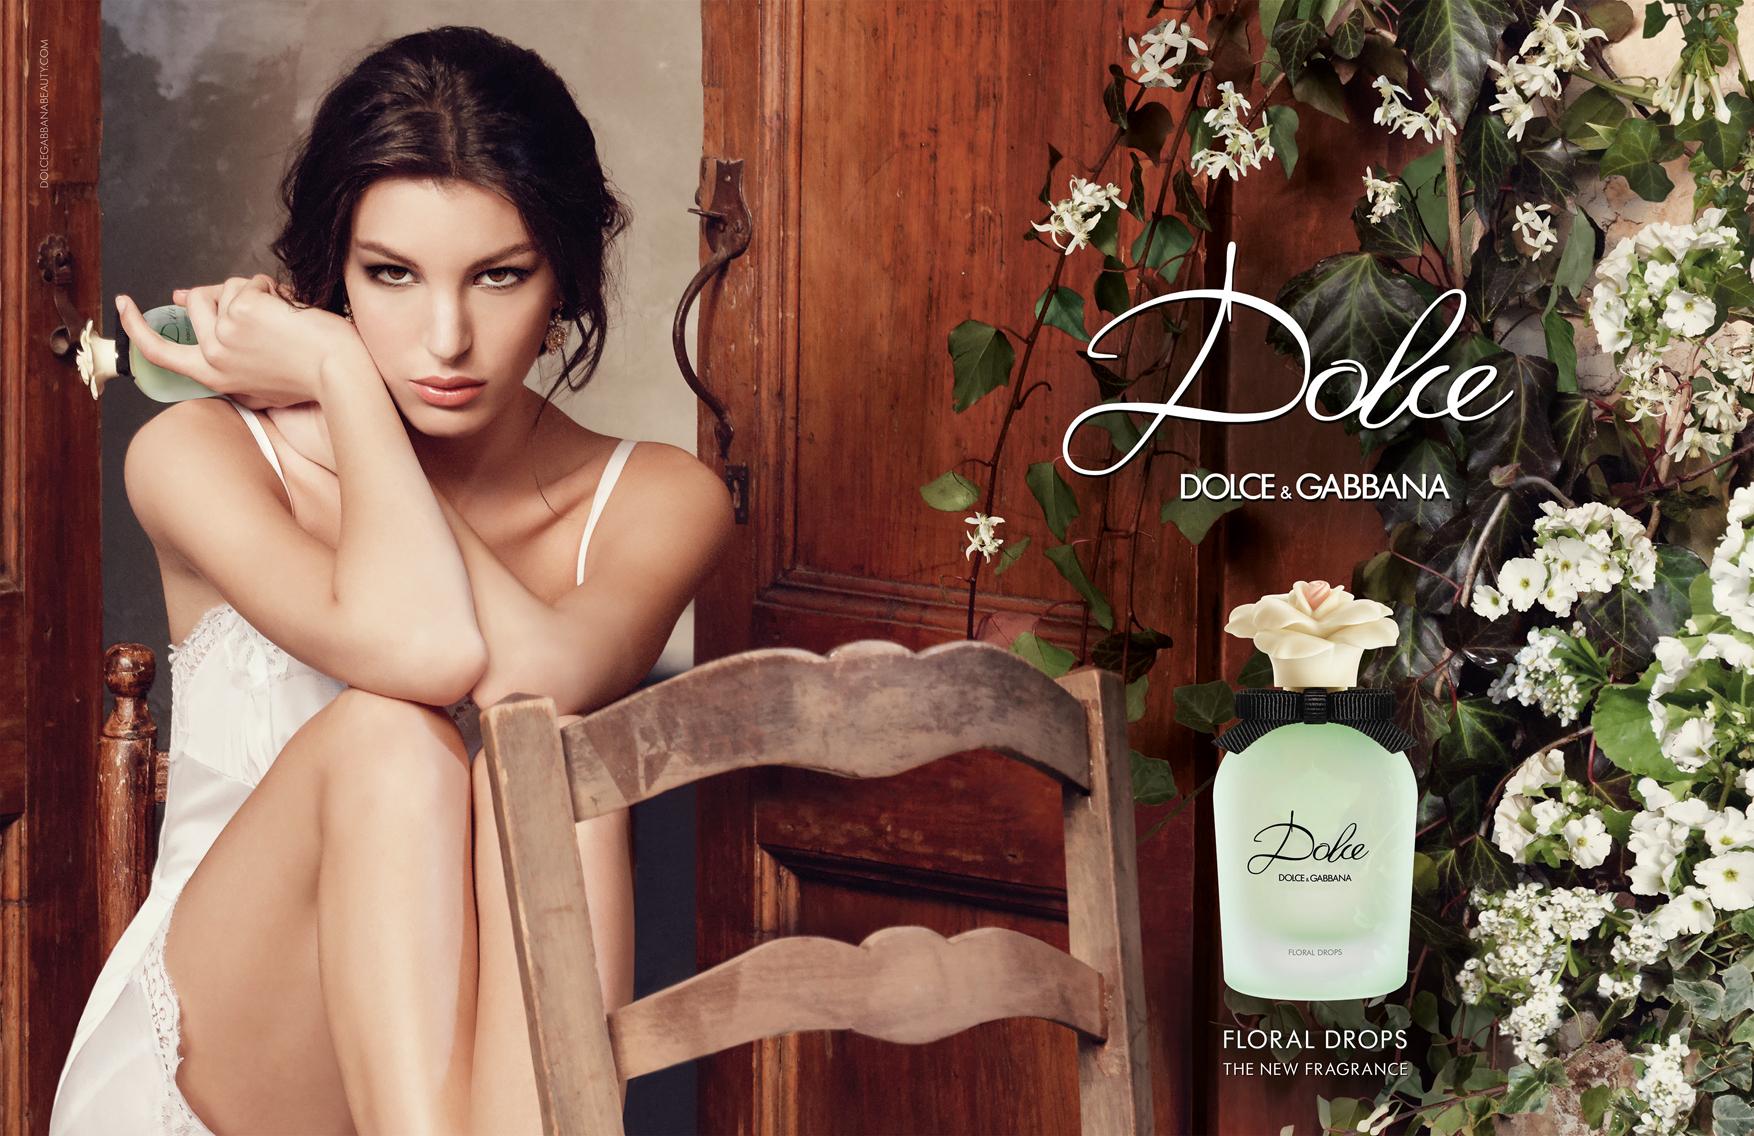 Dolce Floral Drops Visual publicitario